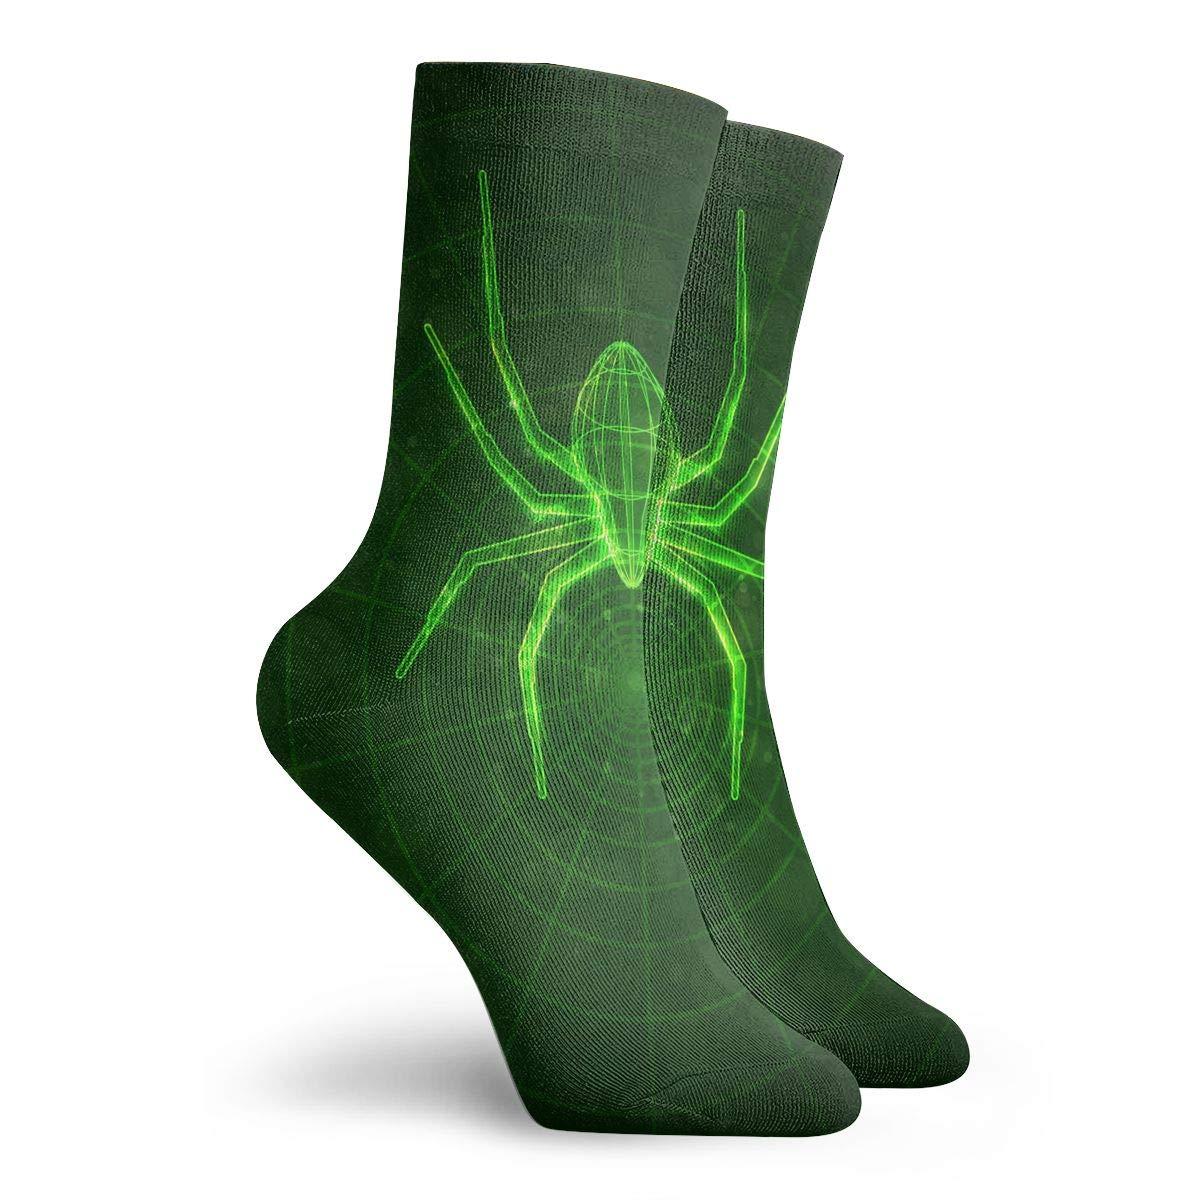 SESY Spider Web Glow In The Dark Unisex Crew Socks Short Sports Stocking